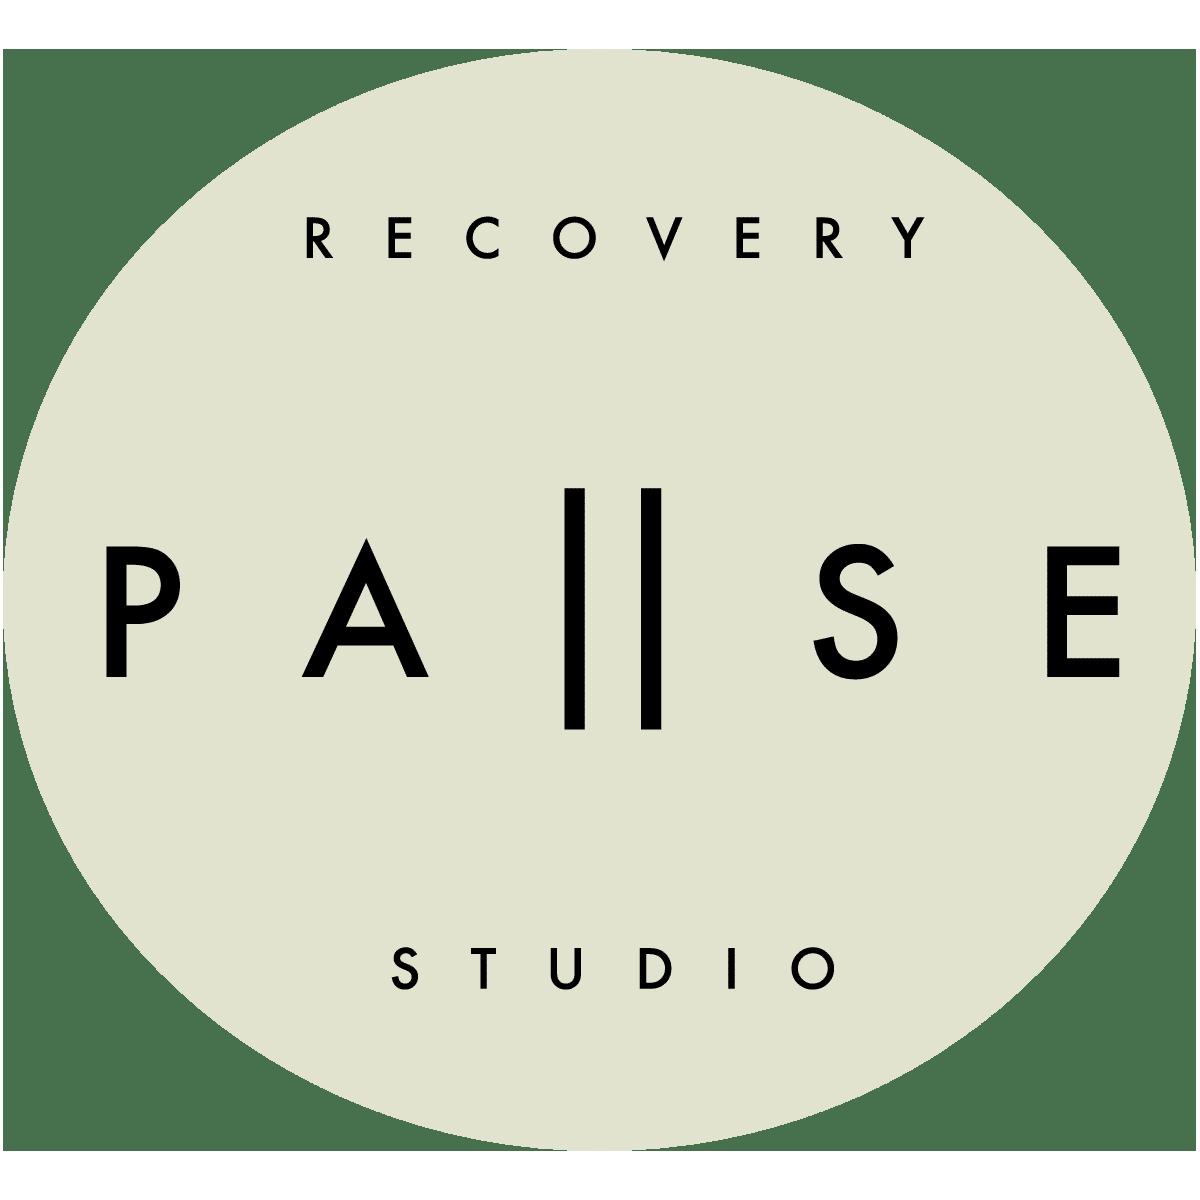 pause recovery studio